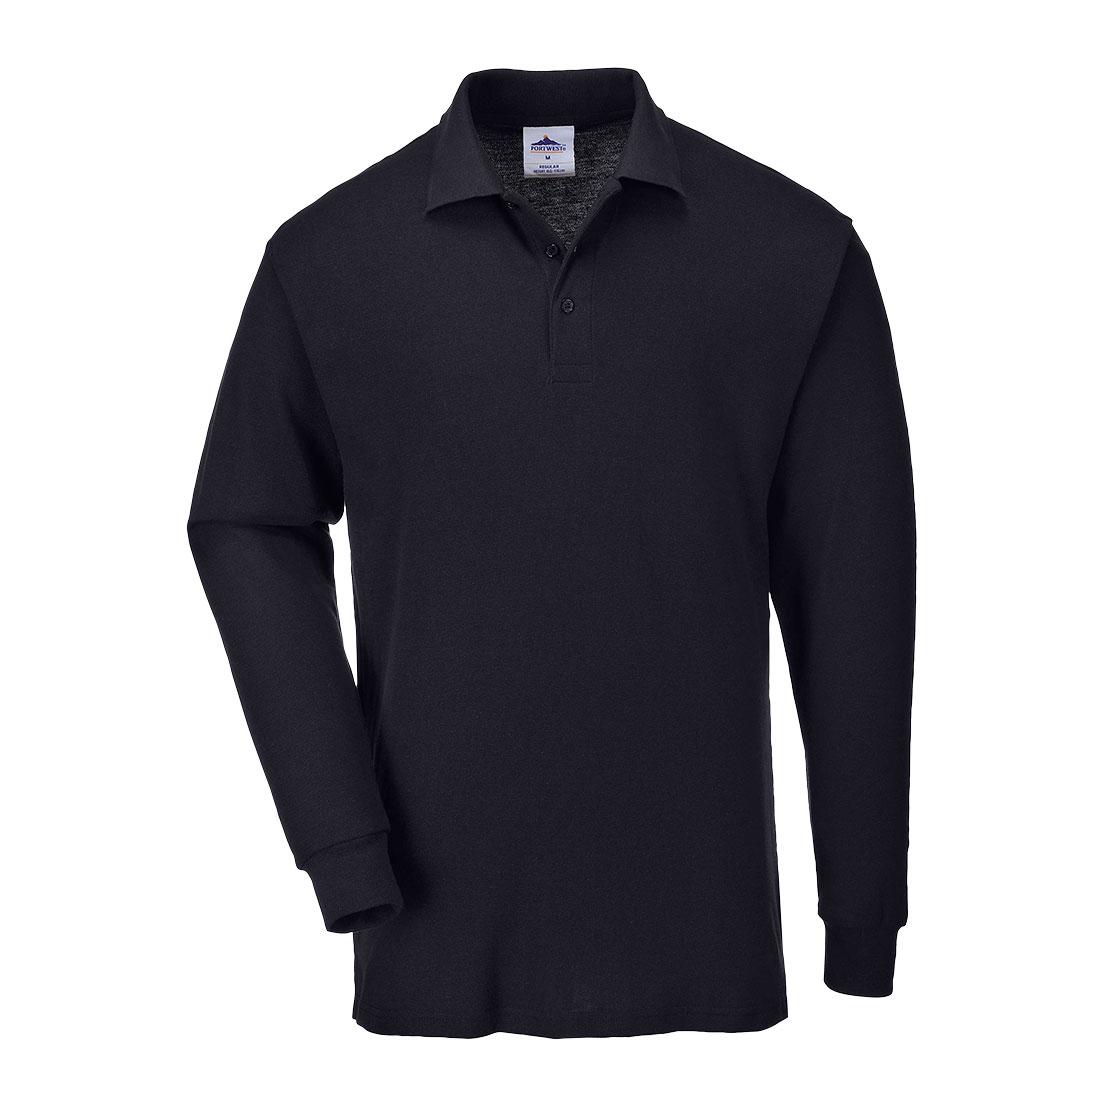 Long Sleeved Polo Shirt Black LR